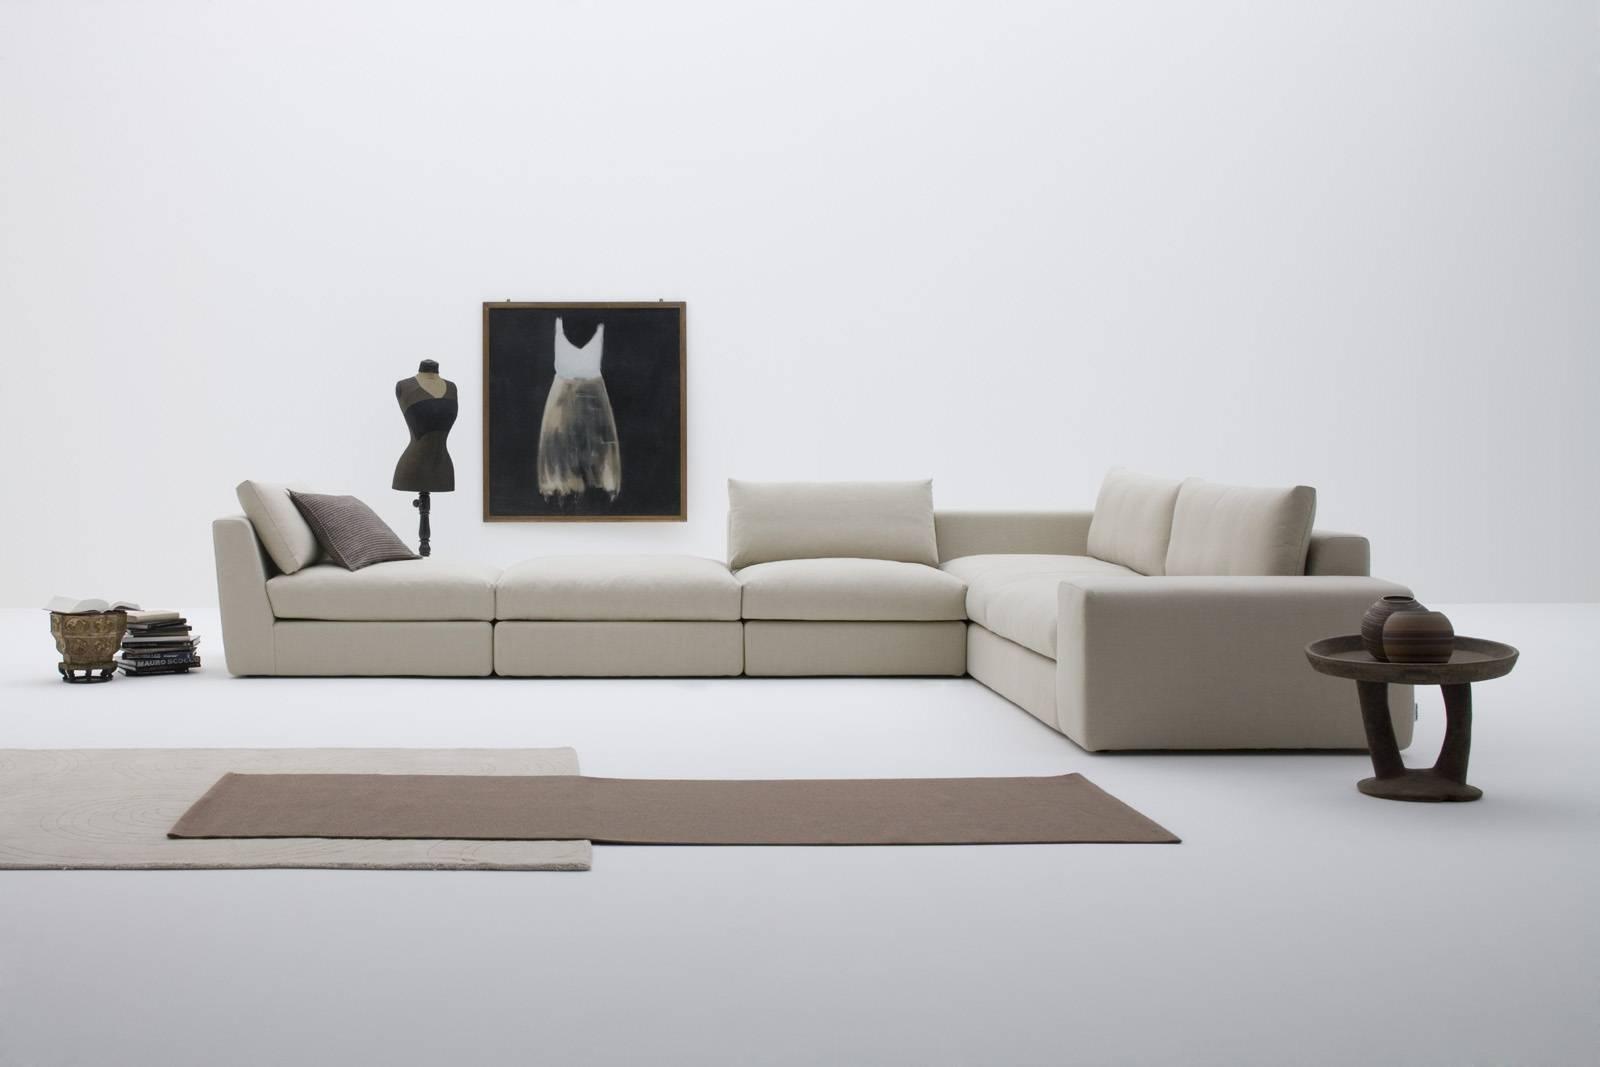 Modular Sofa Newport, Alberta Salotti - Luxury Furniture Mr throughout Newport Sofas (Image 8 of 30)